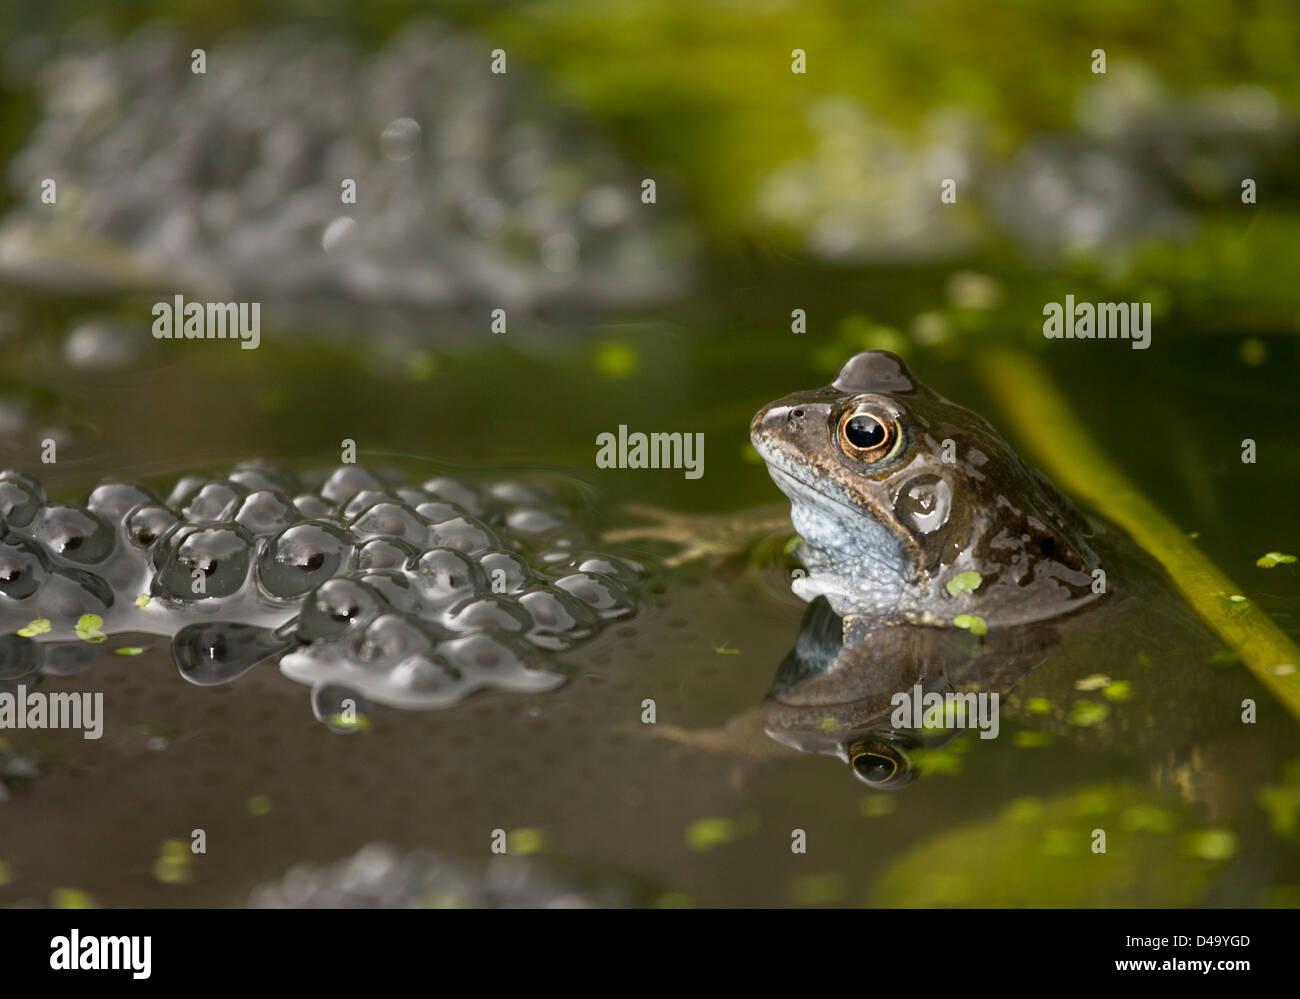 European common brown frog (Rana temporaria) at breeding pond in the mating season; garden pond, Dorset, England - Stock Image